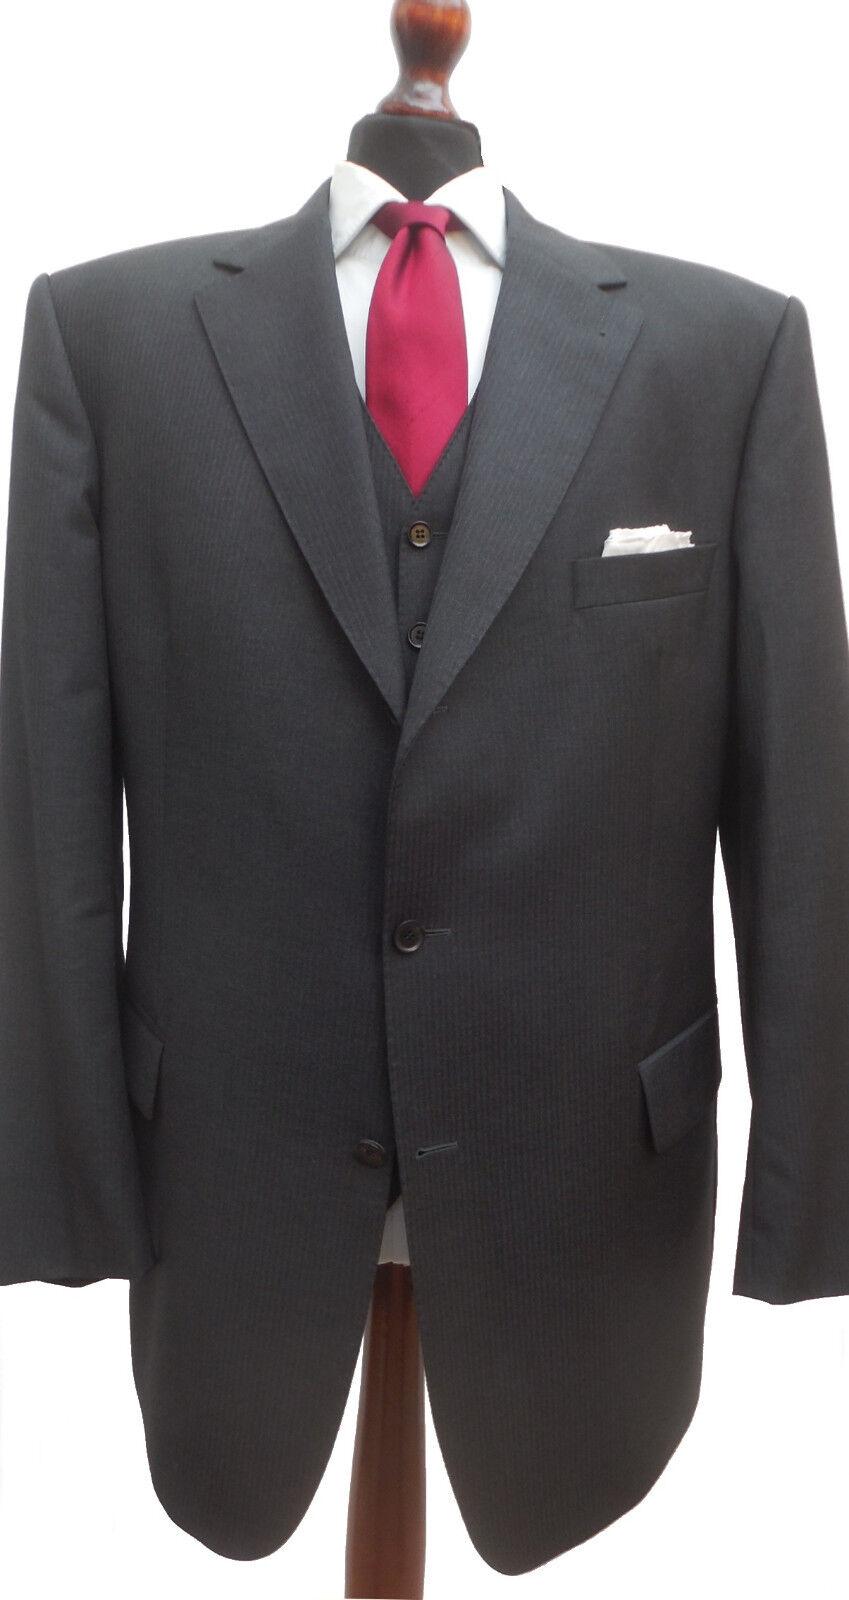 EDUARD DRESSLER Anzug + WESTE Gr. 58 Dreiteiler Super 100's dunkelgrau